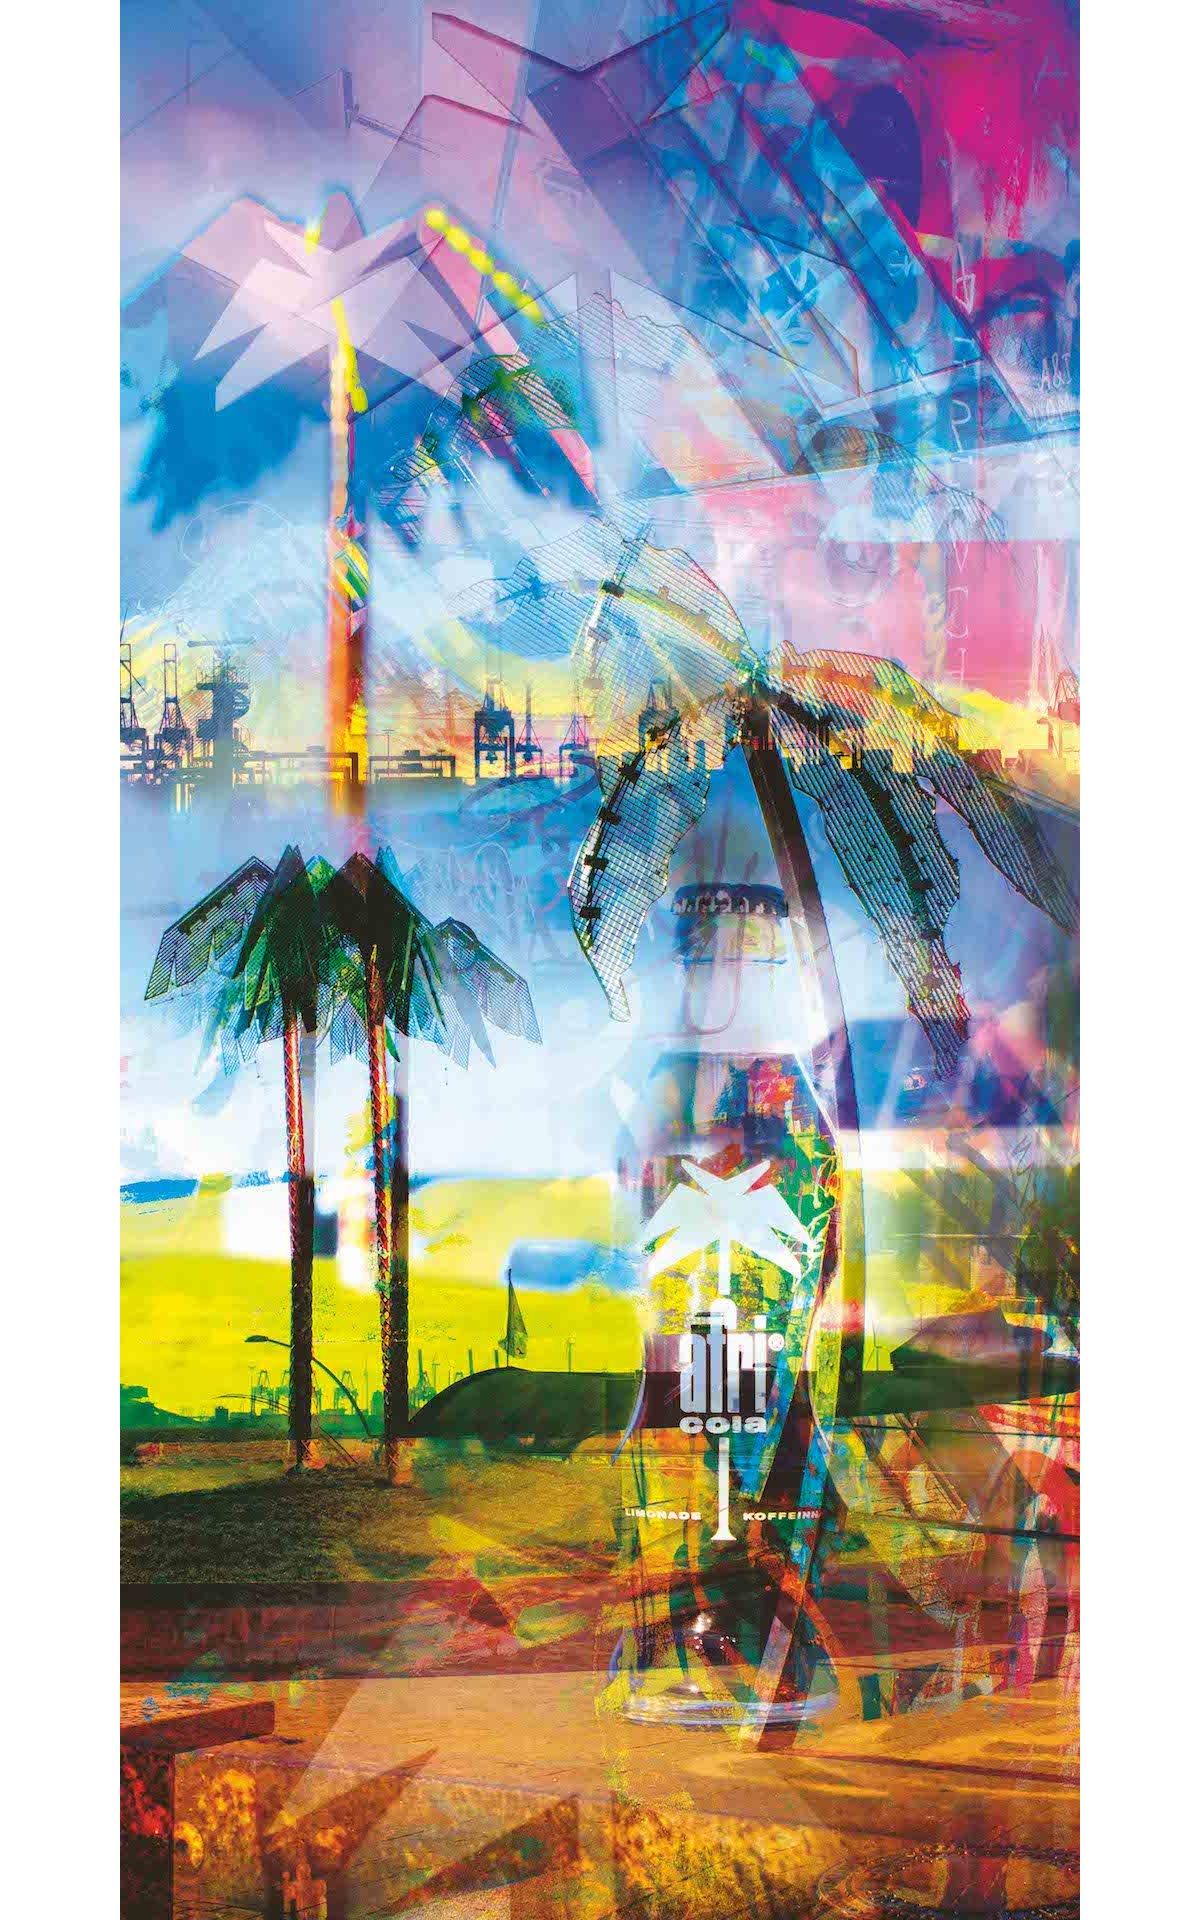 Africola-annabellehoffmann-popartstreetart-urbanart-galerie-afri-popstreetshop